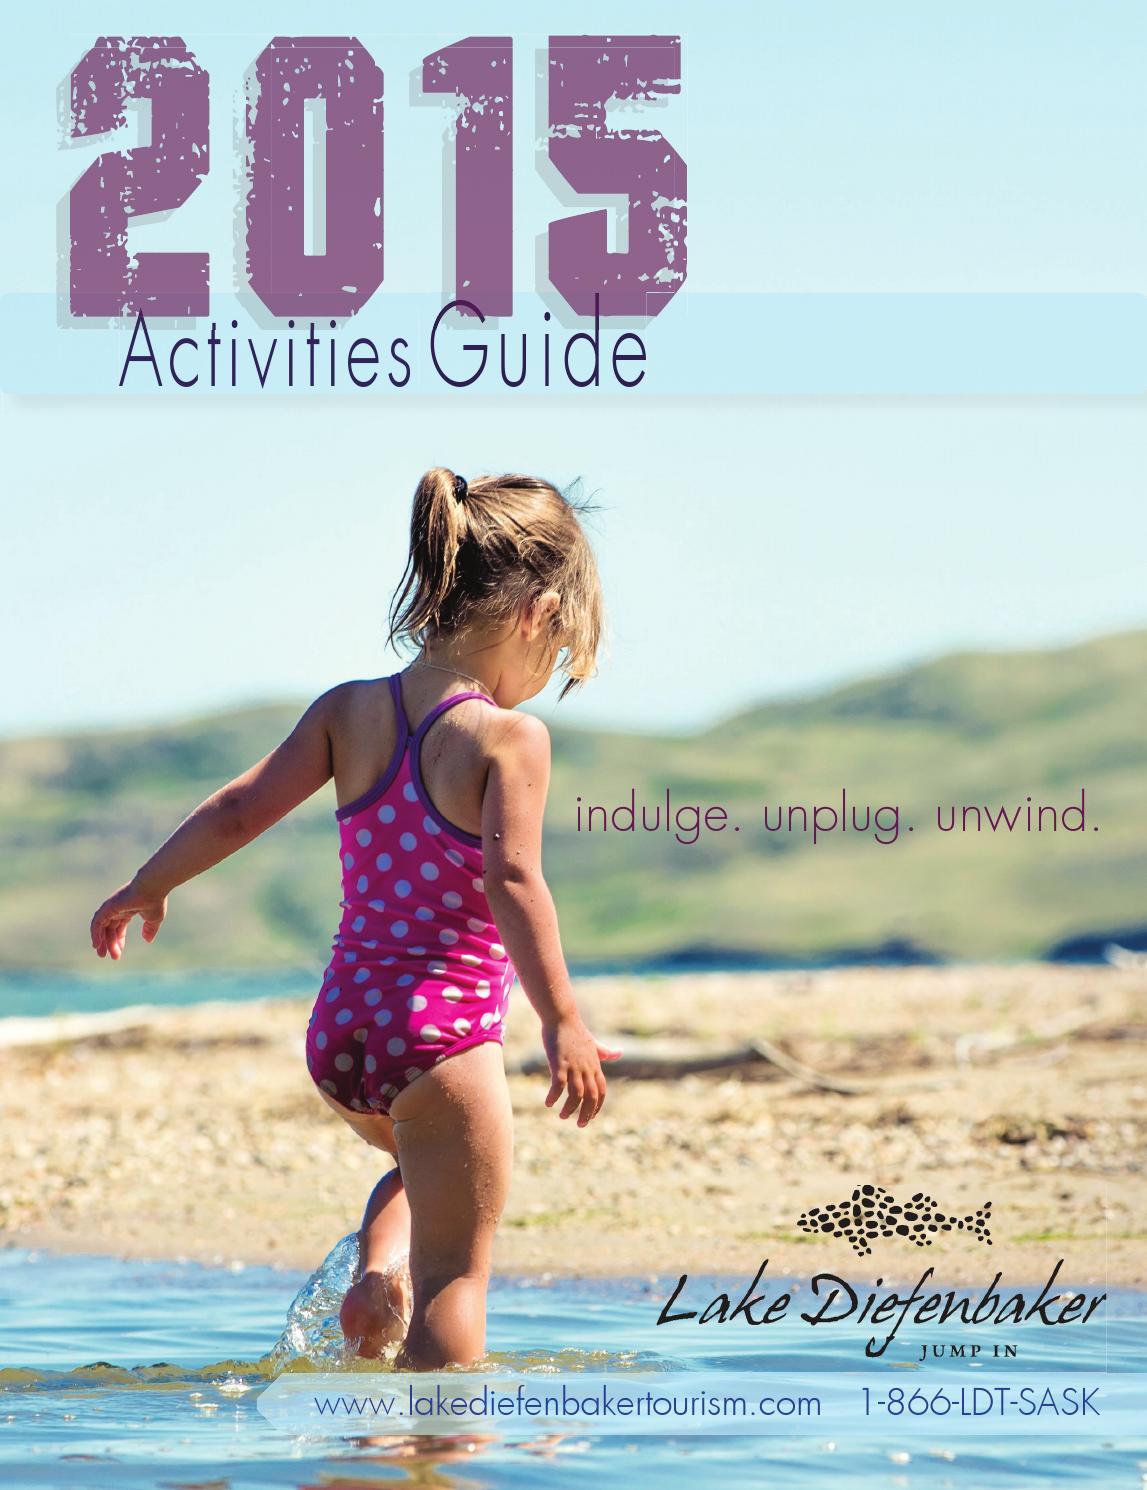 sask hunting guide 2015 map